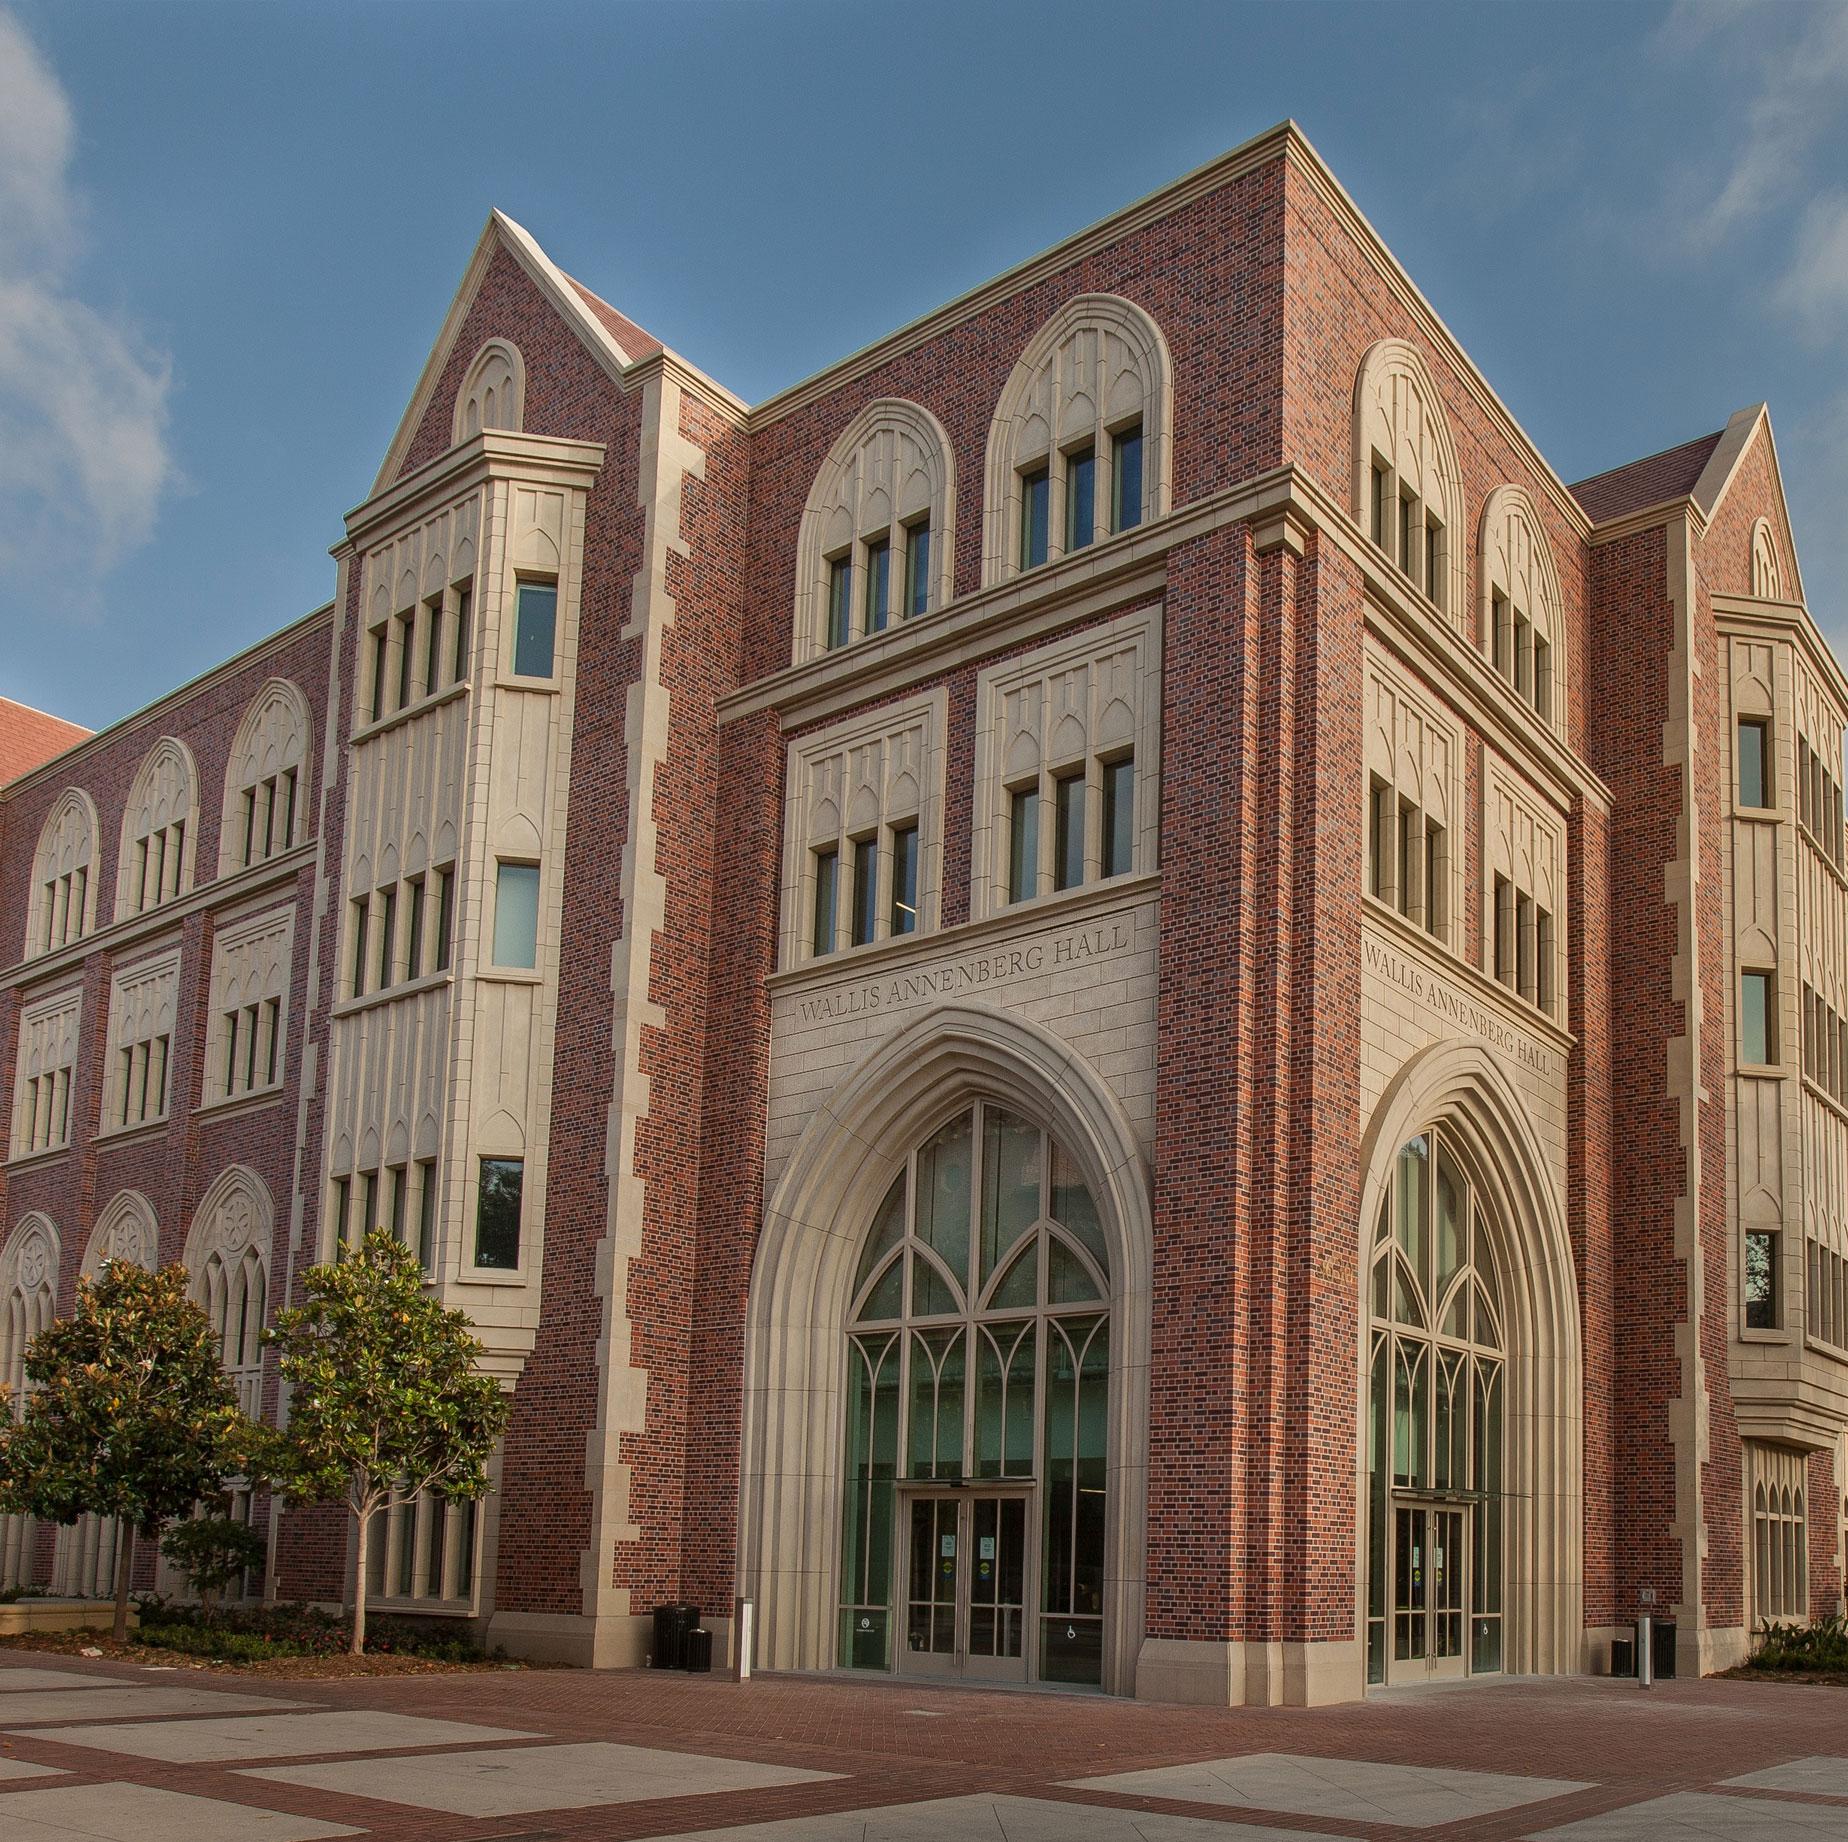 Wallis Annenberg Hall at USC